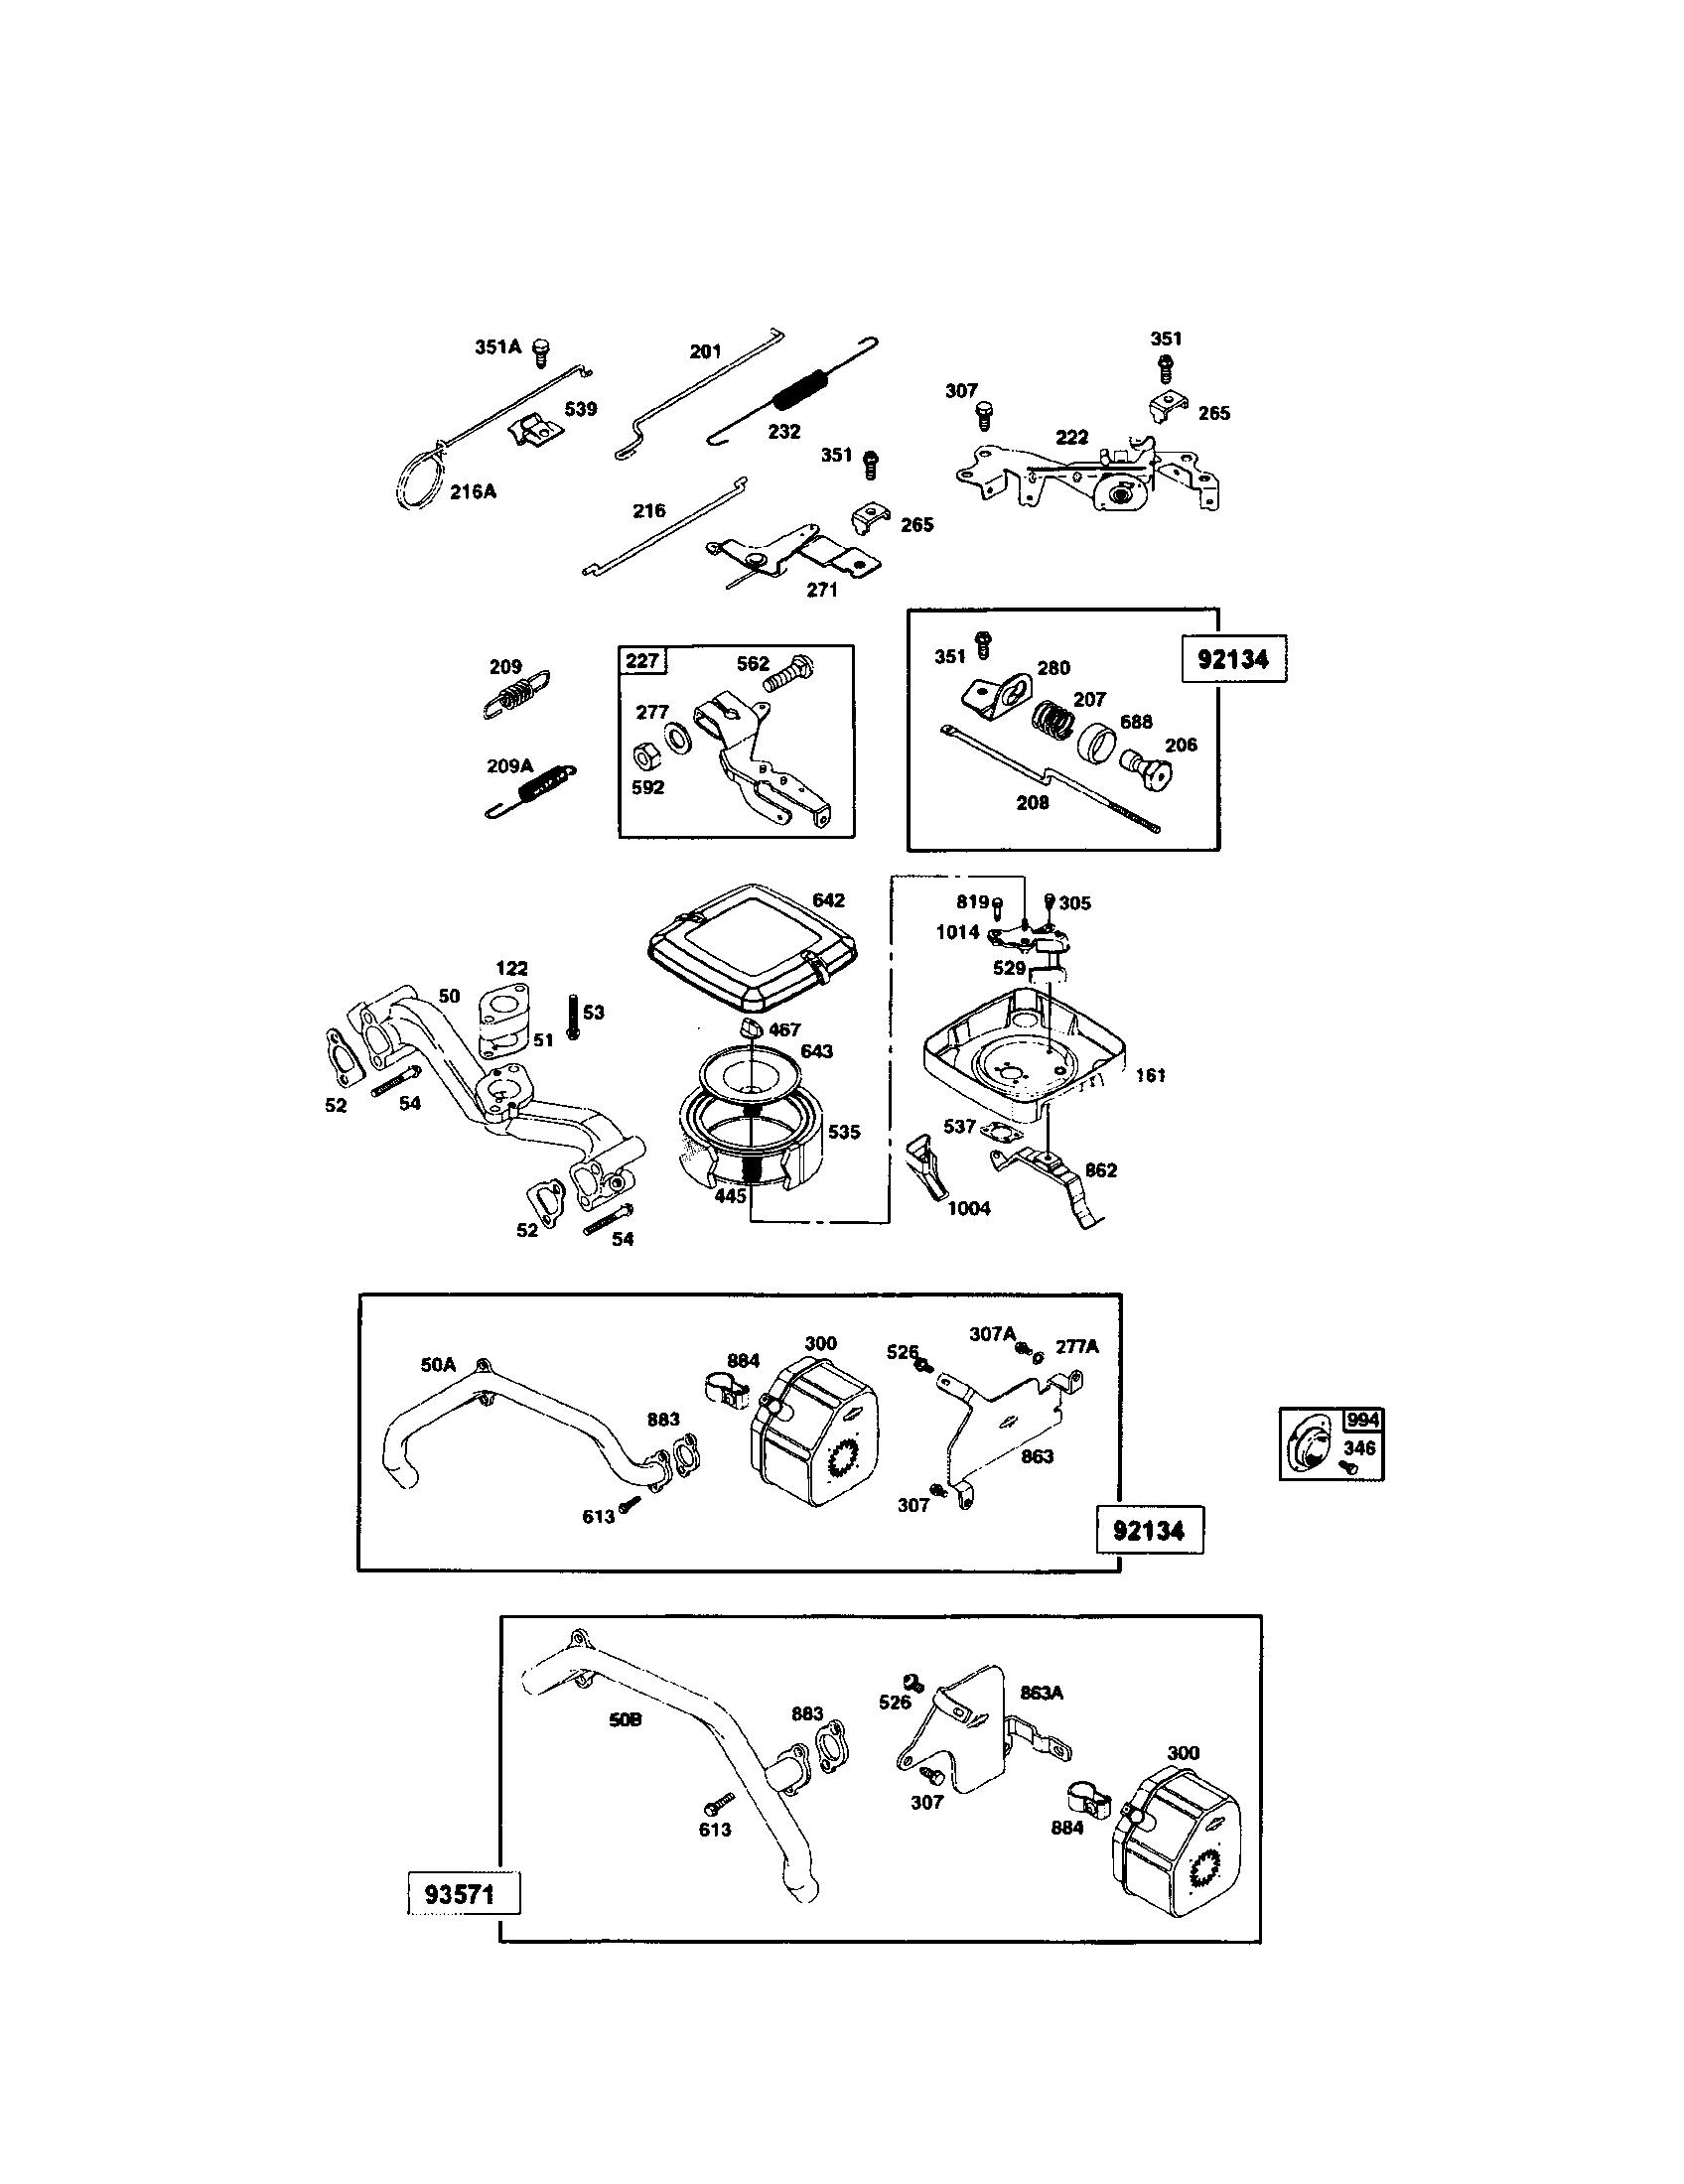 briggs and stratton vanguard carburetor diagram iveco daily 2007 wiring 303447 imageresizertool com